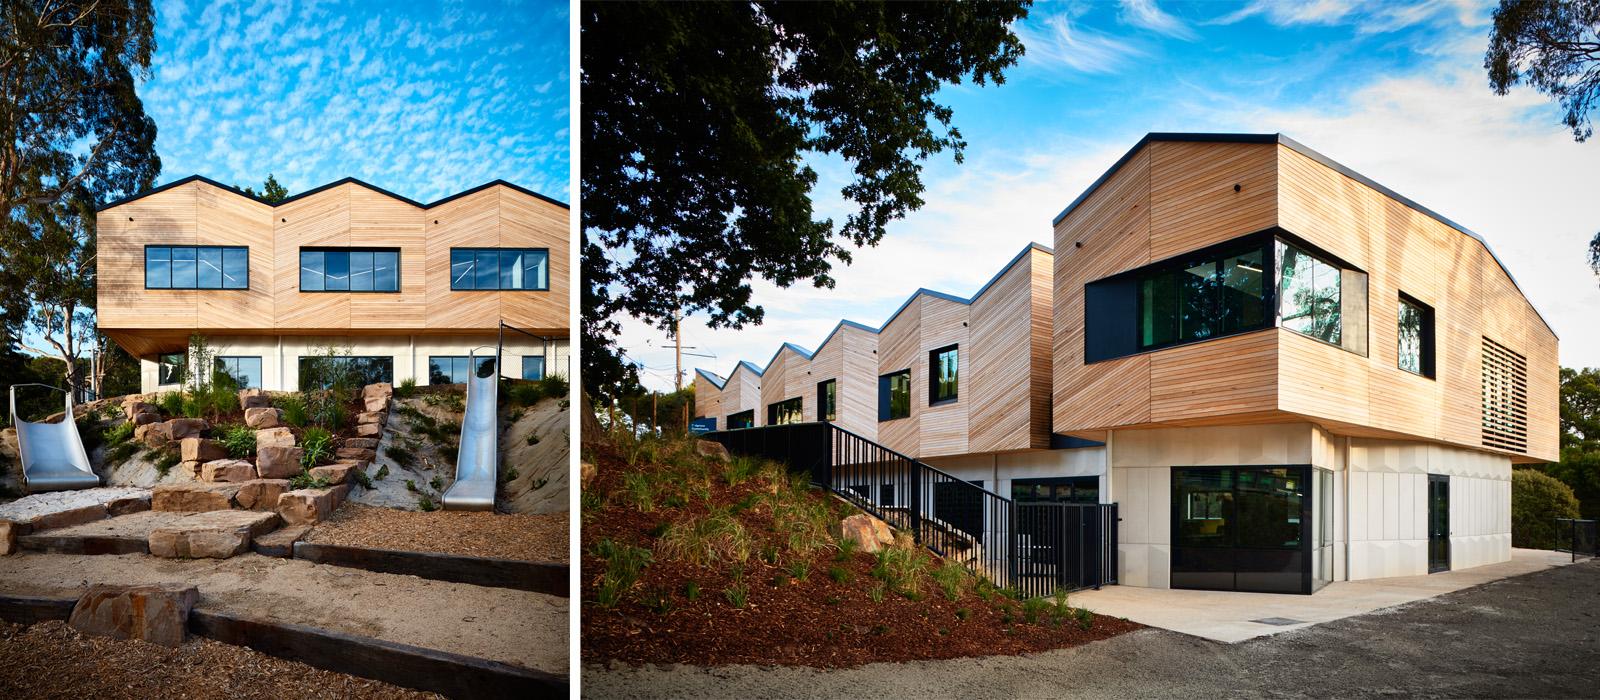 H2o-Architects-Melbourne-Australia-Belgrave-Community-Hub-05